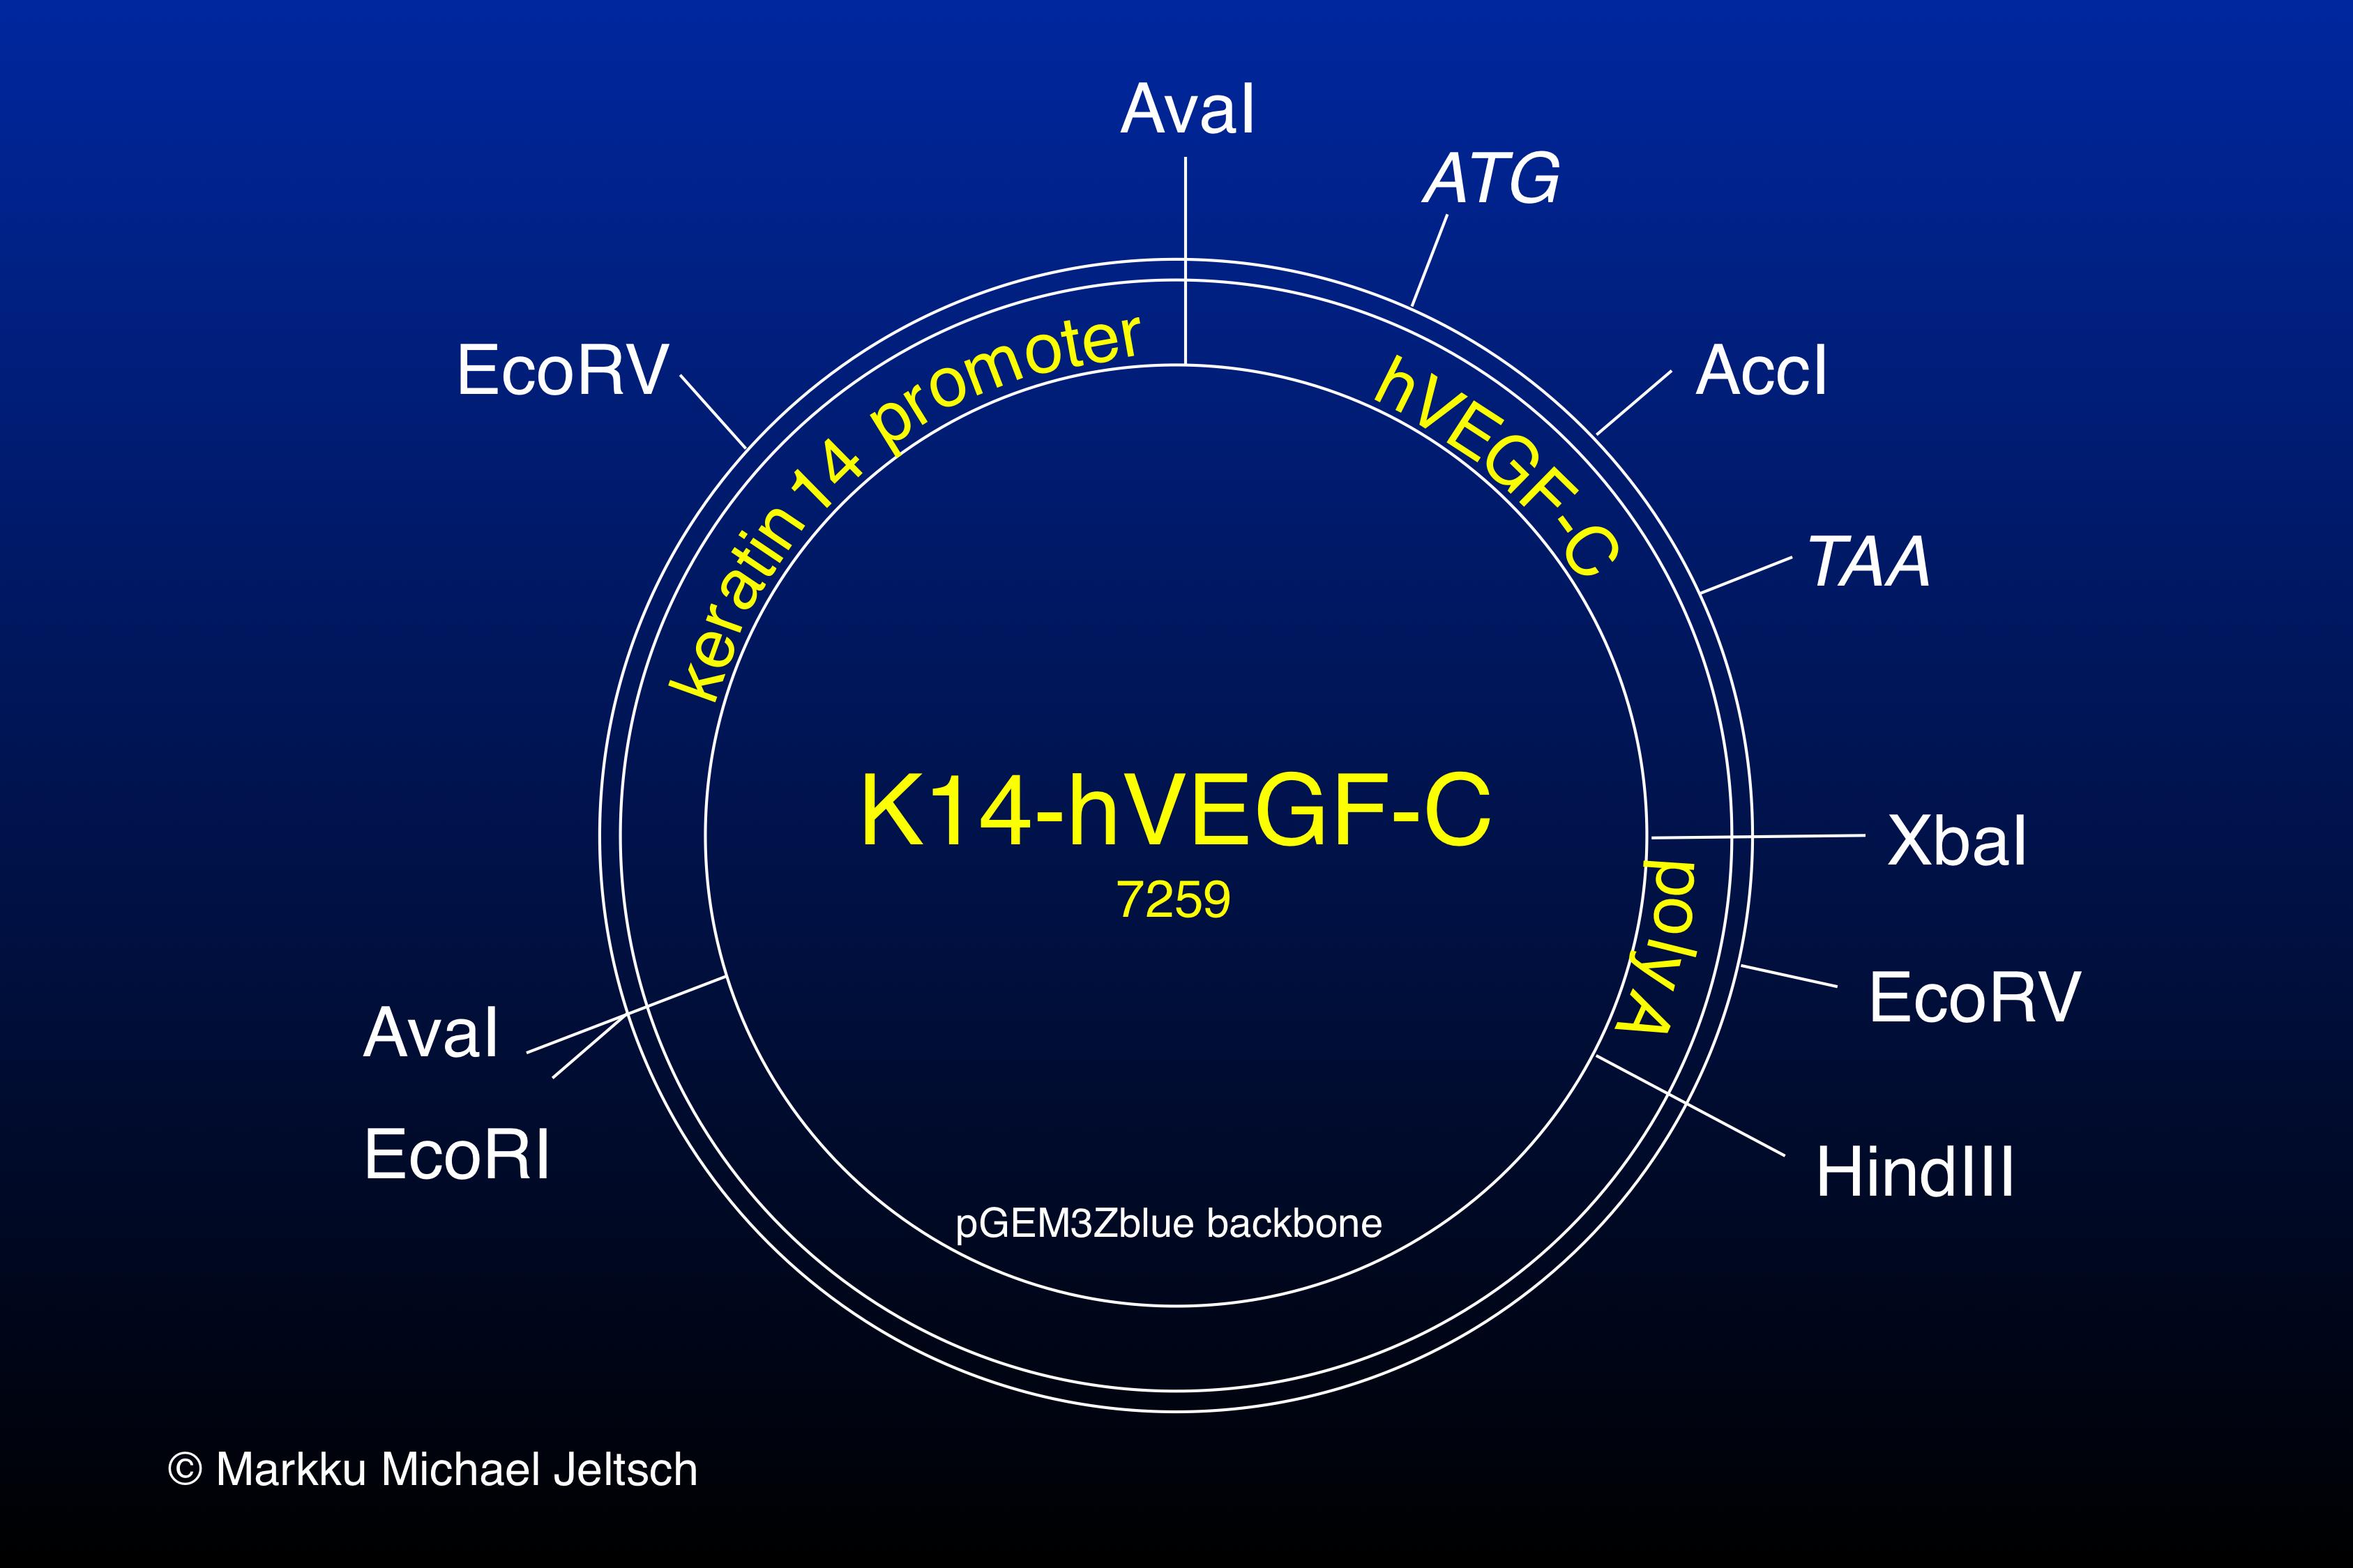 K14-hVEGF-C transgene expression vector map